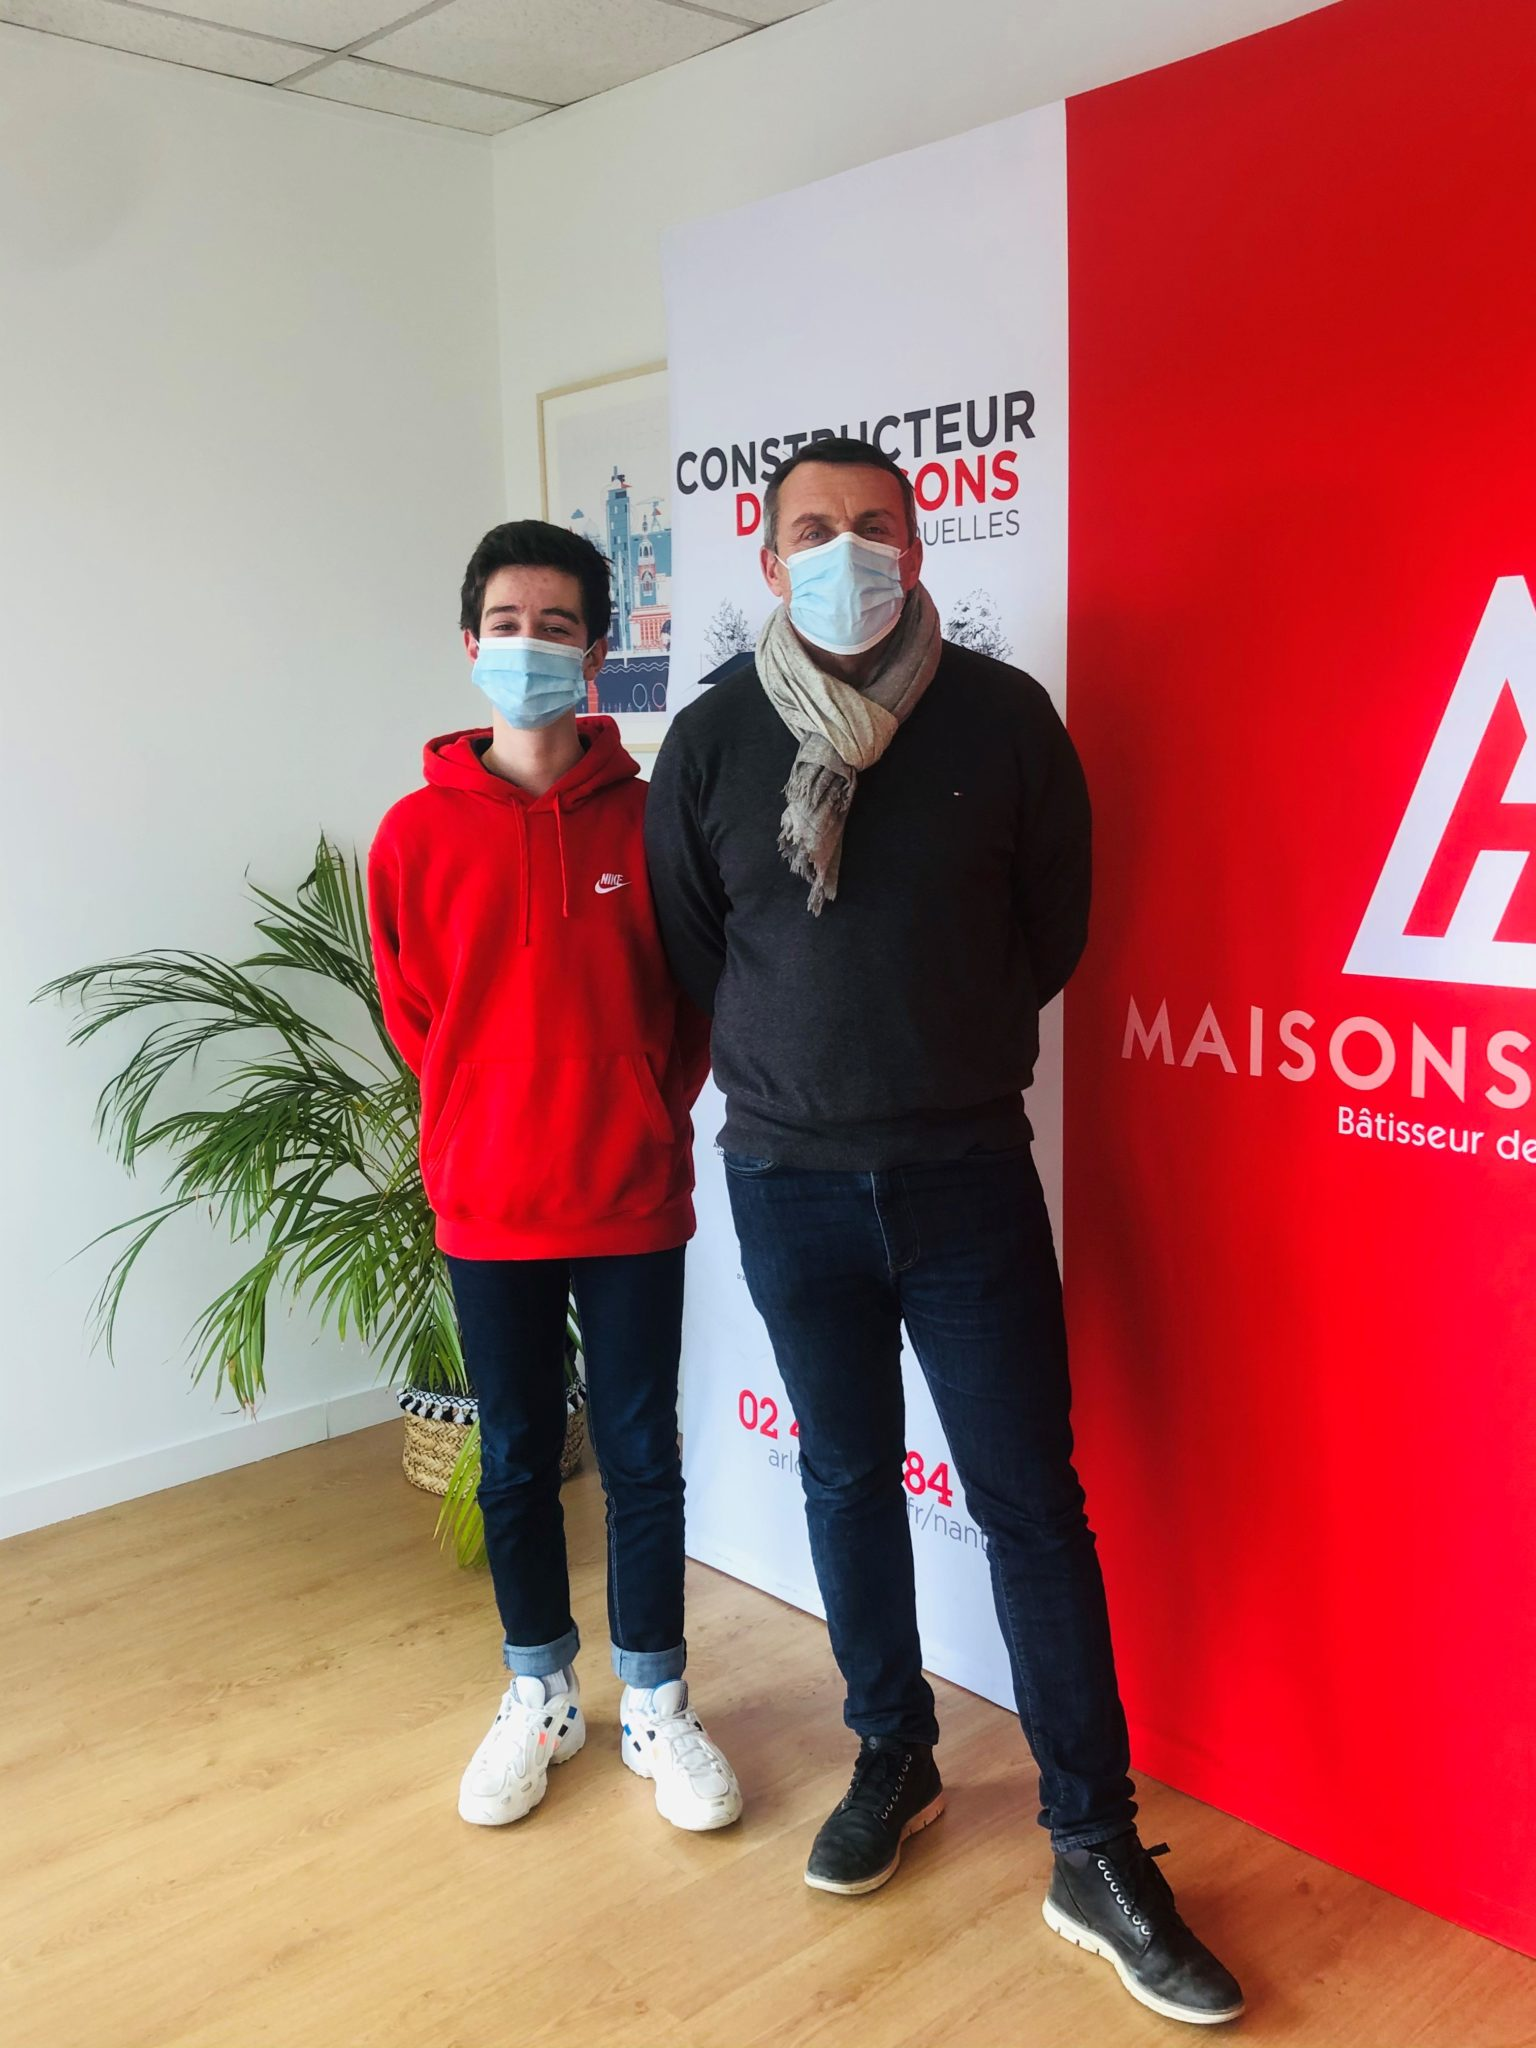 stagiaire Maisons Arlogis Nantes